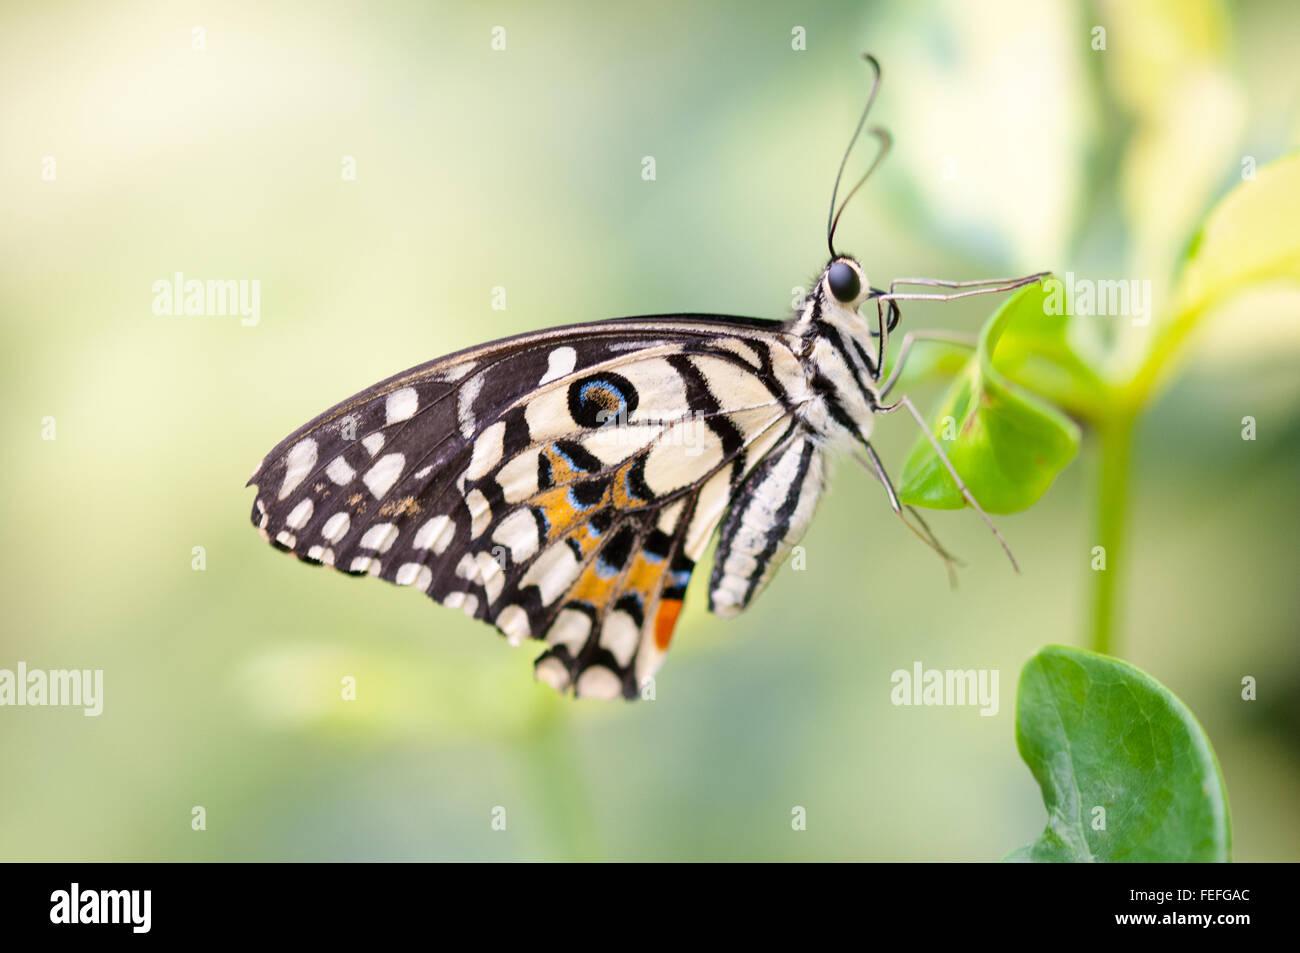 Papilio demoleus a coda di rondine di limone lime butterfly al Museo di Storia Naturale tenda a Londra, Inghilterra. Immagini Stock